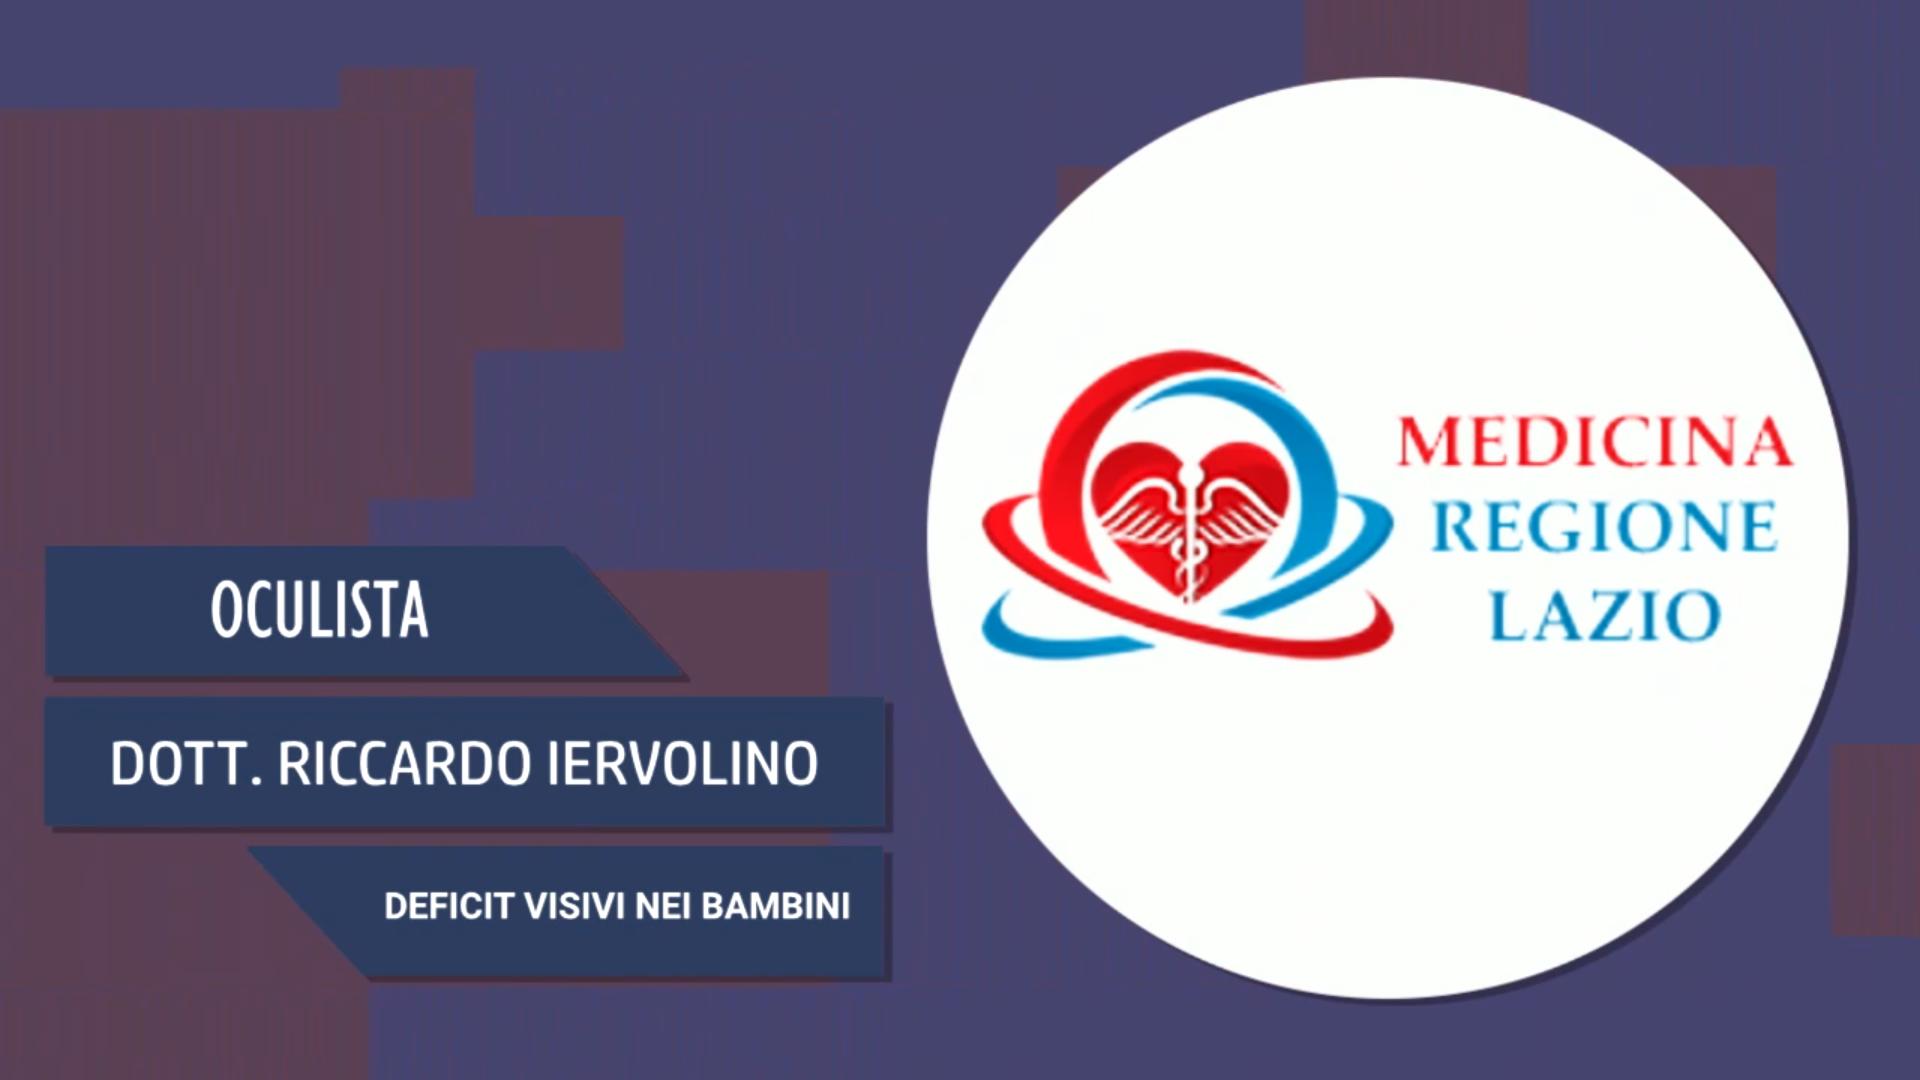 Intervista al Dott. Riccardo Iervolino – Deficit visivi nei bambini